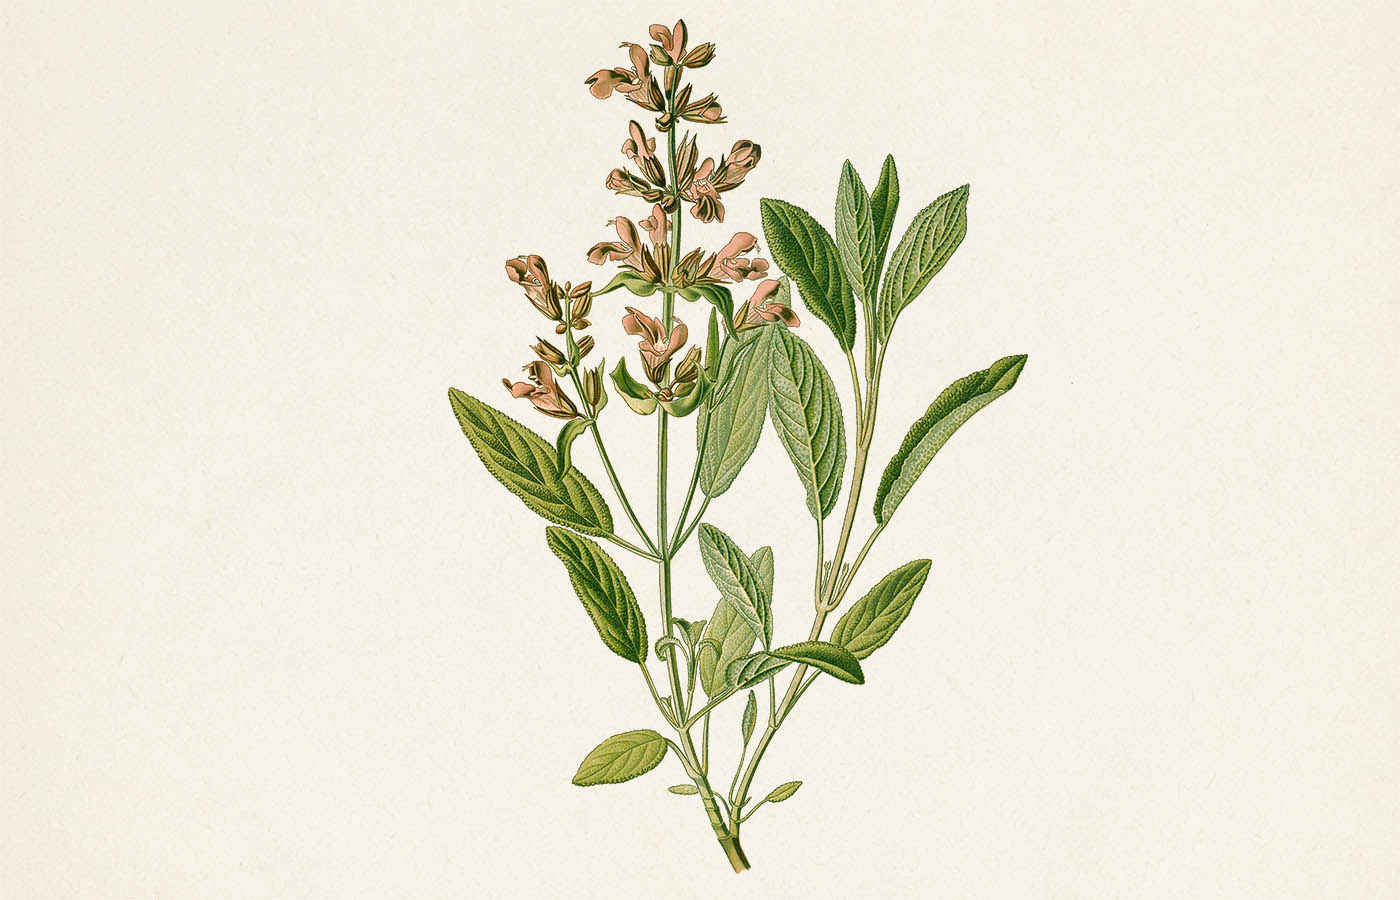 Šalvěj lékařská - Salvia oficinalis